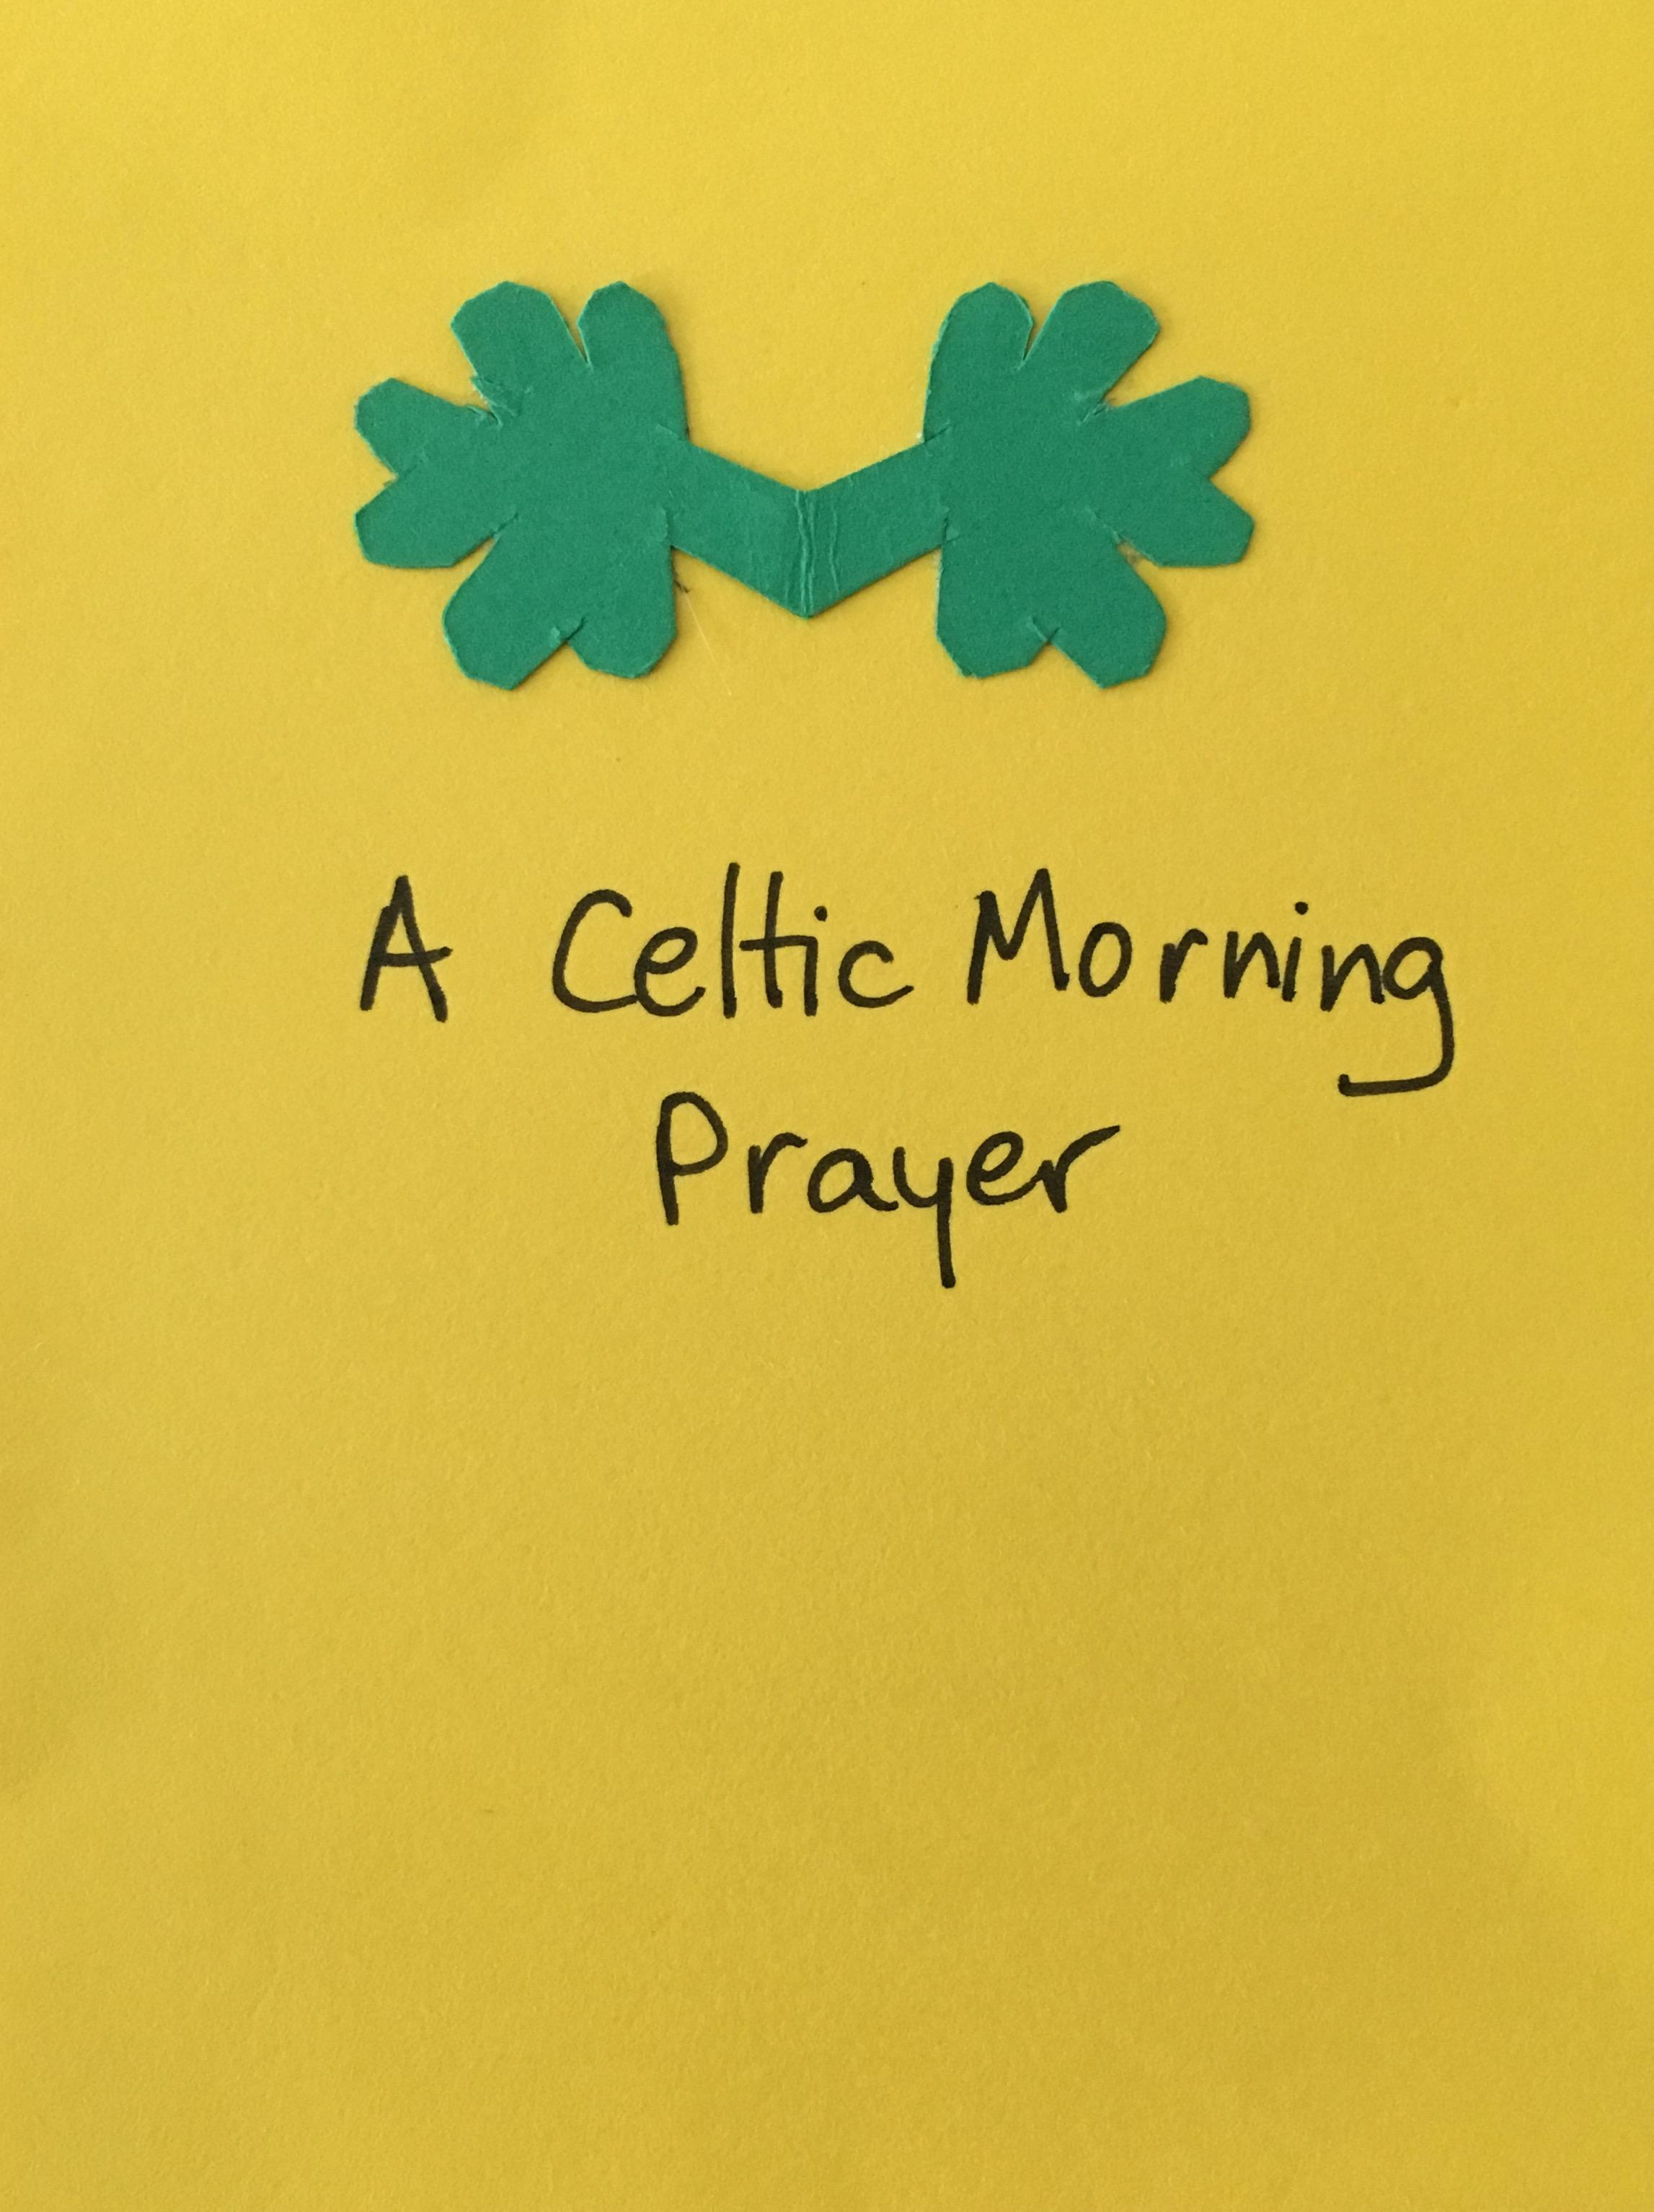 Paired shamrocks on a zine I designed using a tradition Celtic Prayer